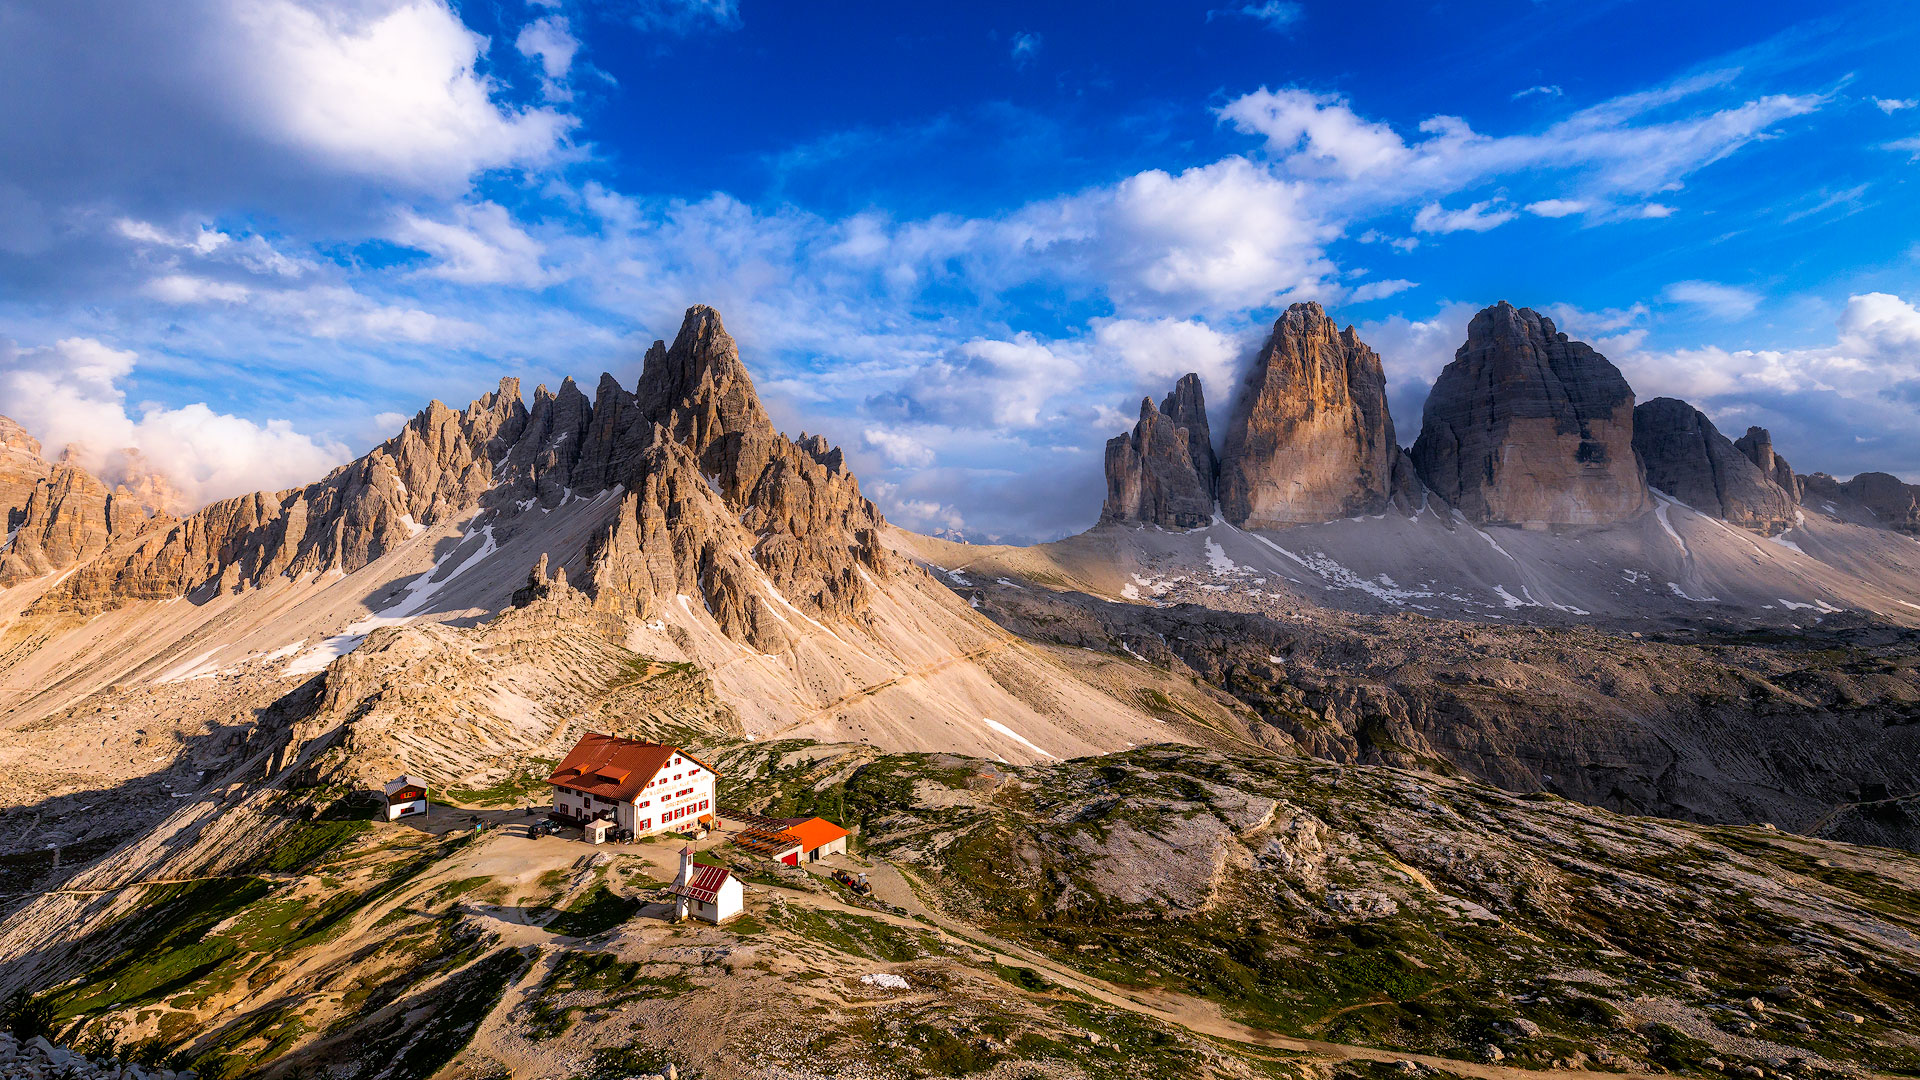 De berghut en de Tre Cime di Lavaredo